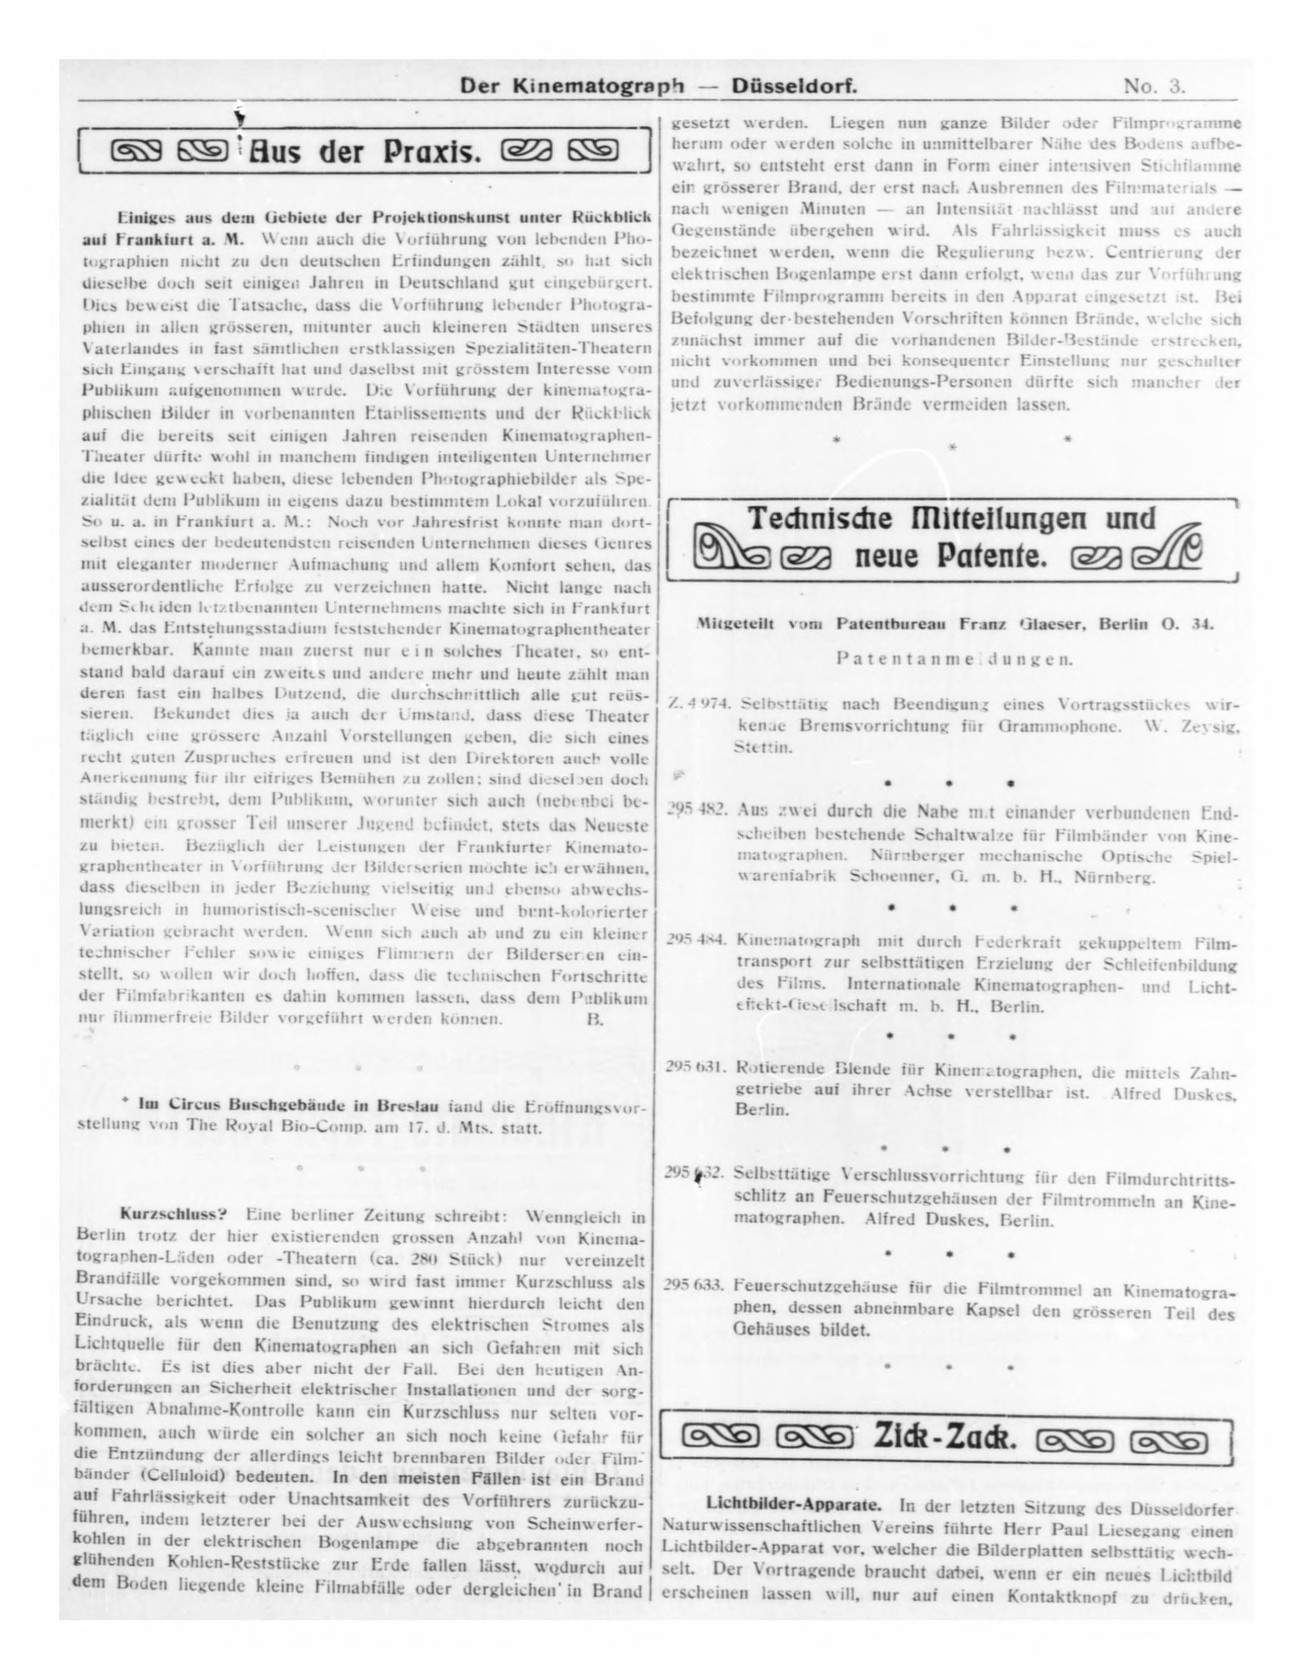 Kinematograph01-1907-01_jp2.zip&file=kinematograph01-1907-01_jp2%2fkinematograph01-1907-01_0028